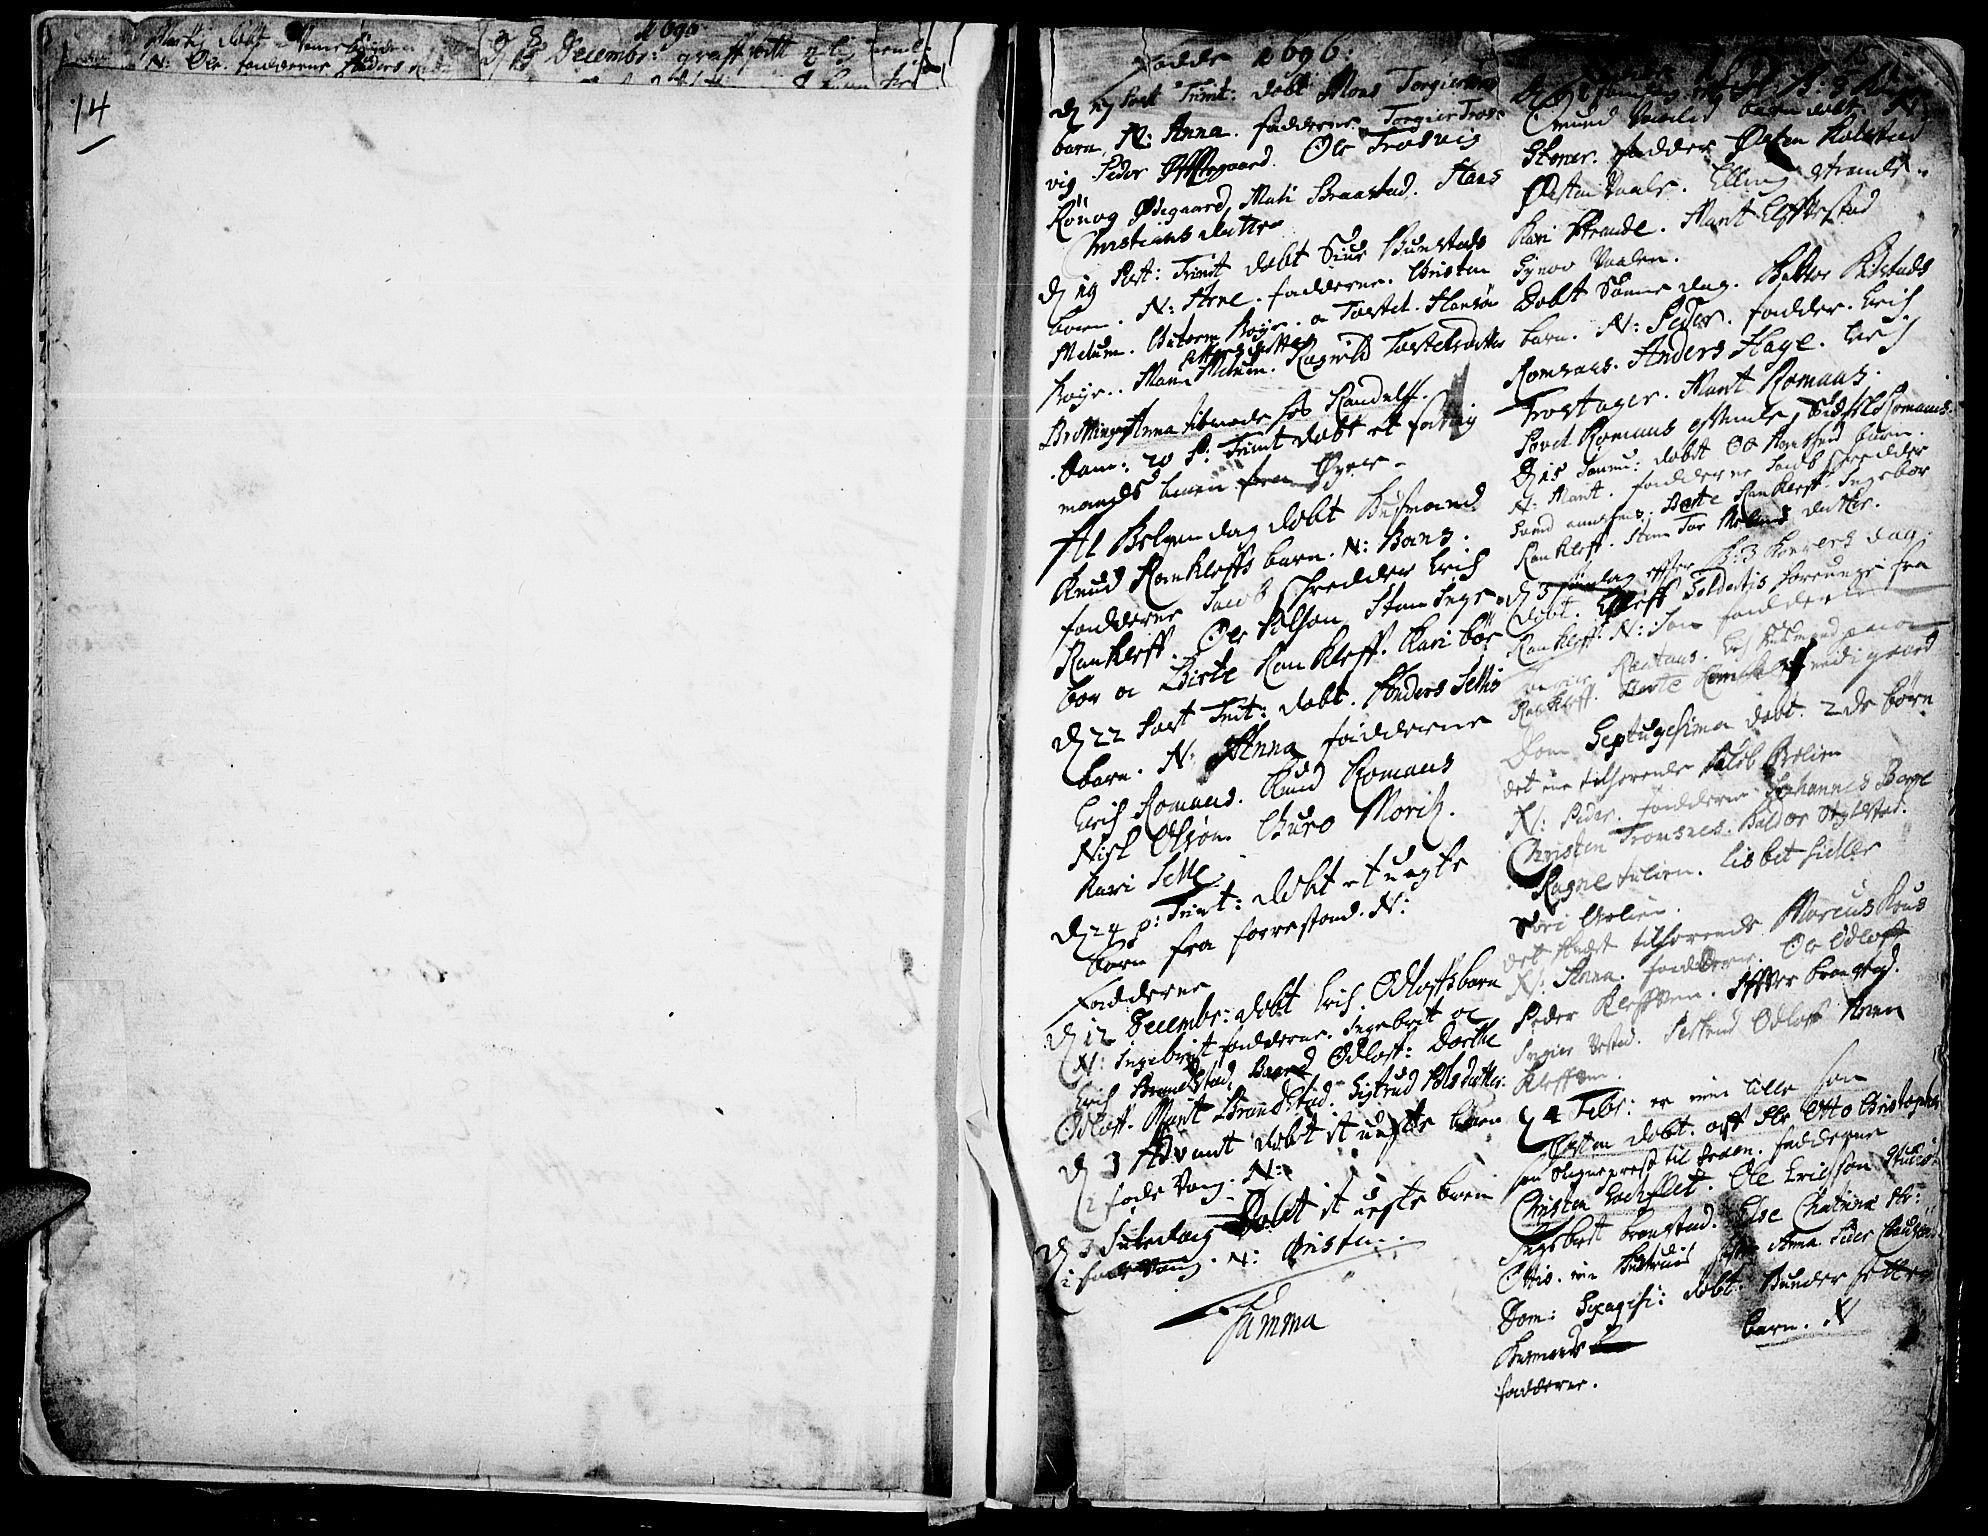 SAH, Ringebu prestekontor, Ministerialbok nr. 1, 1696-1733, s. 14-15